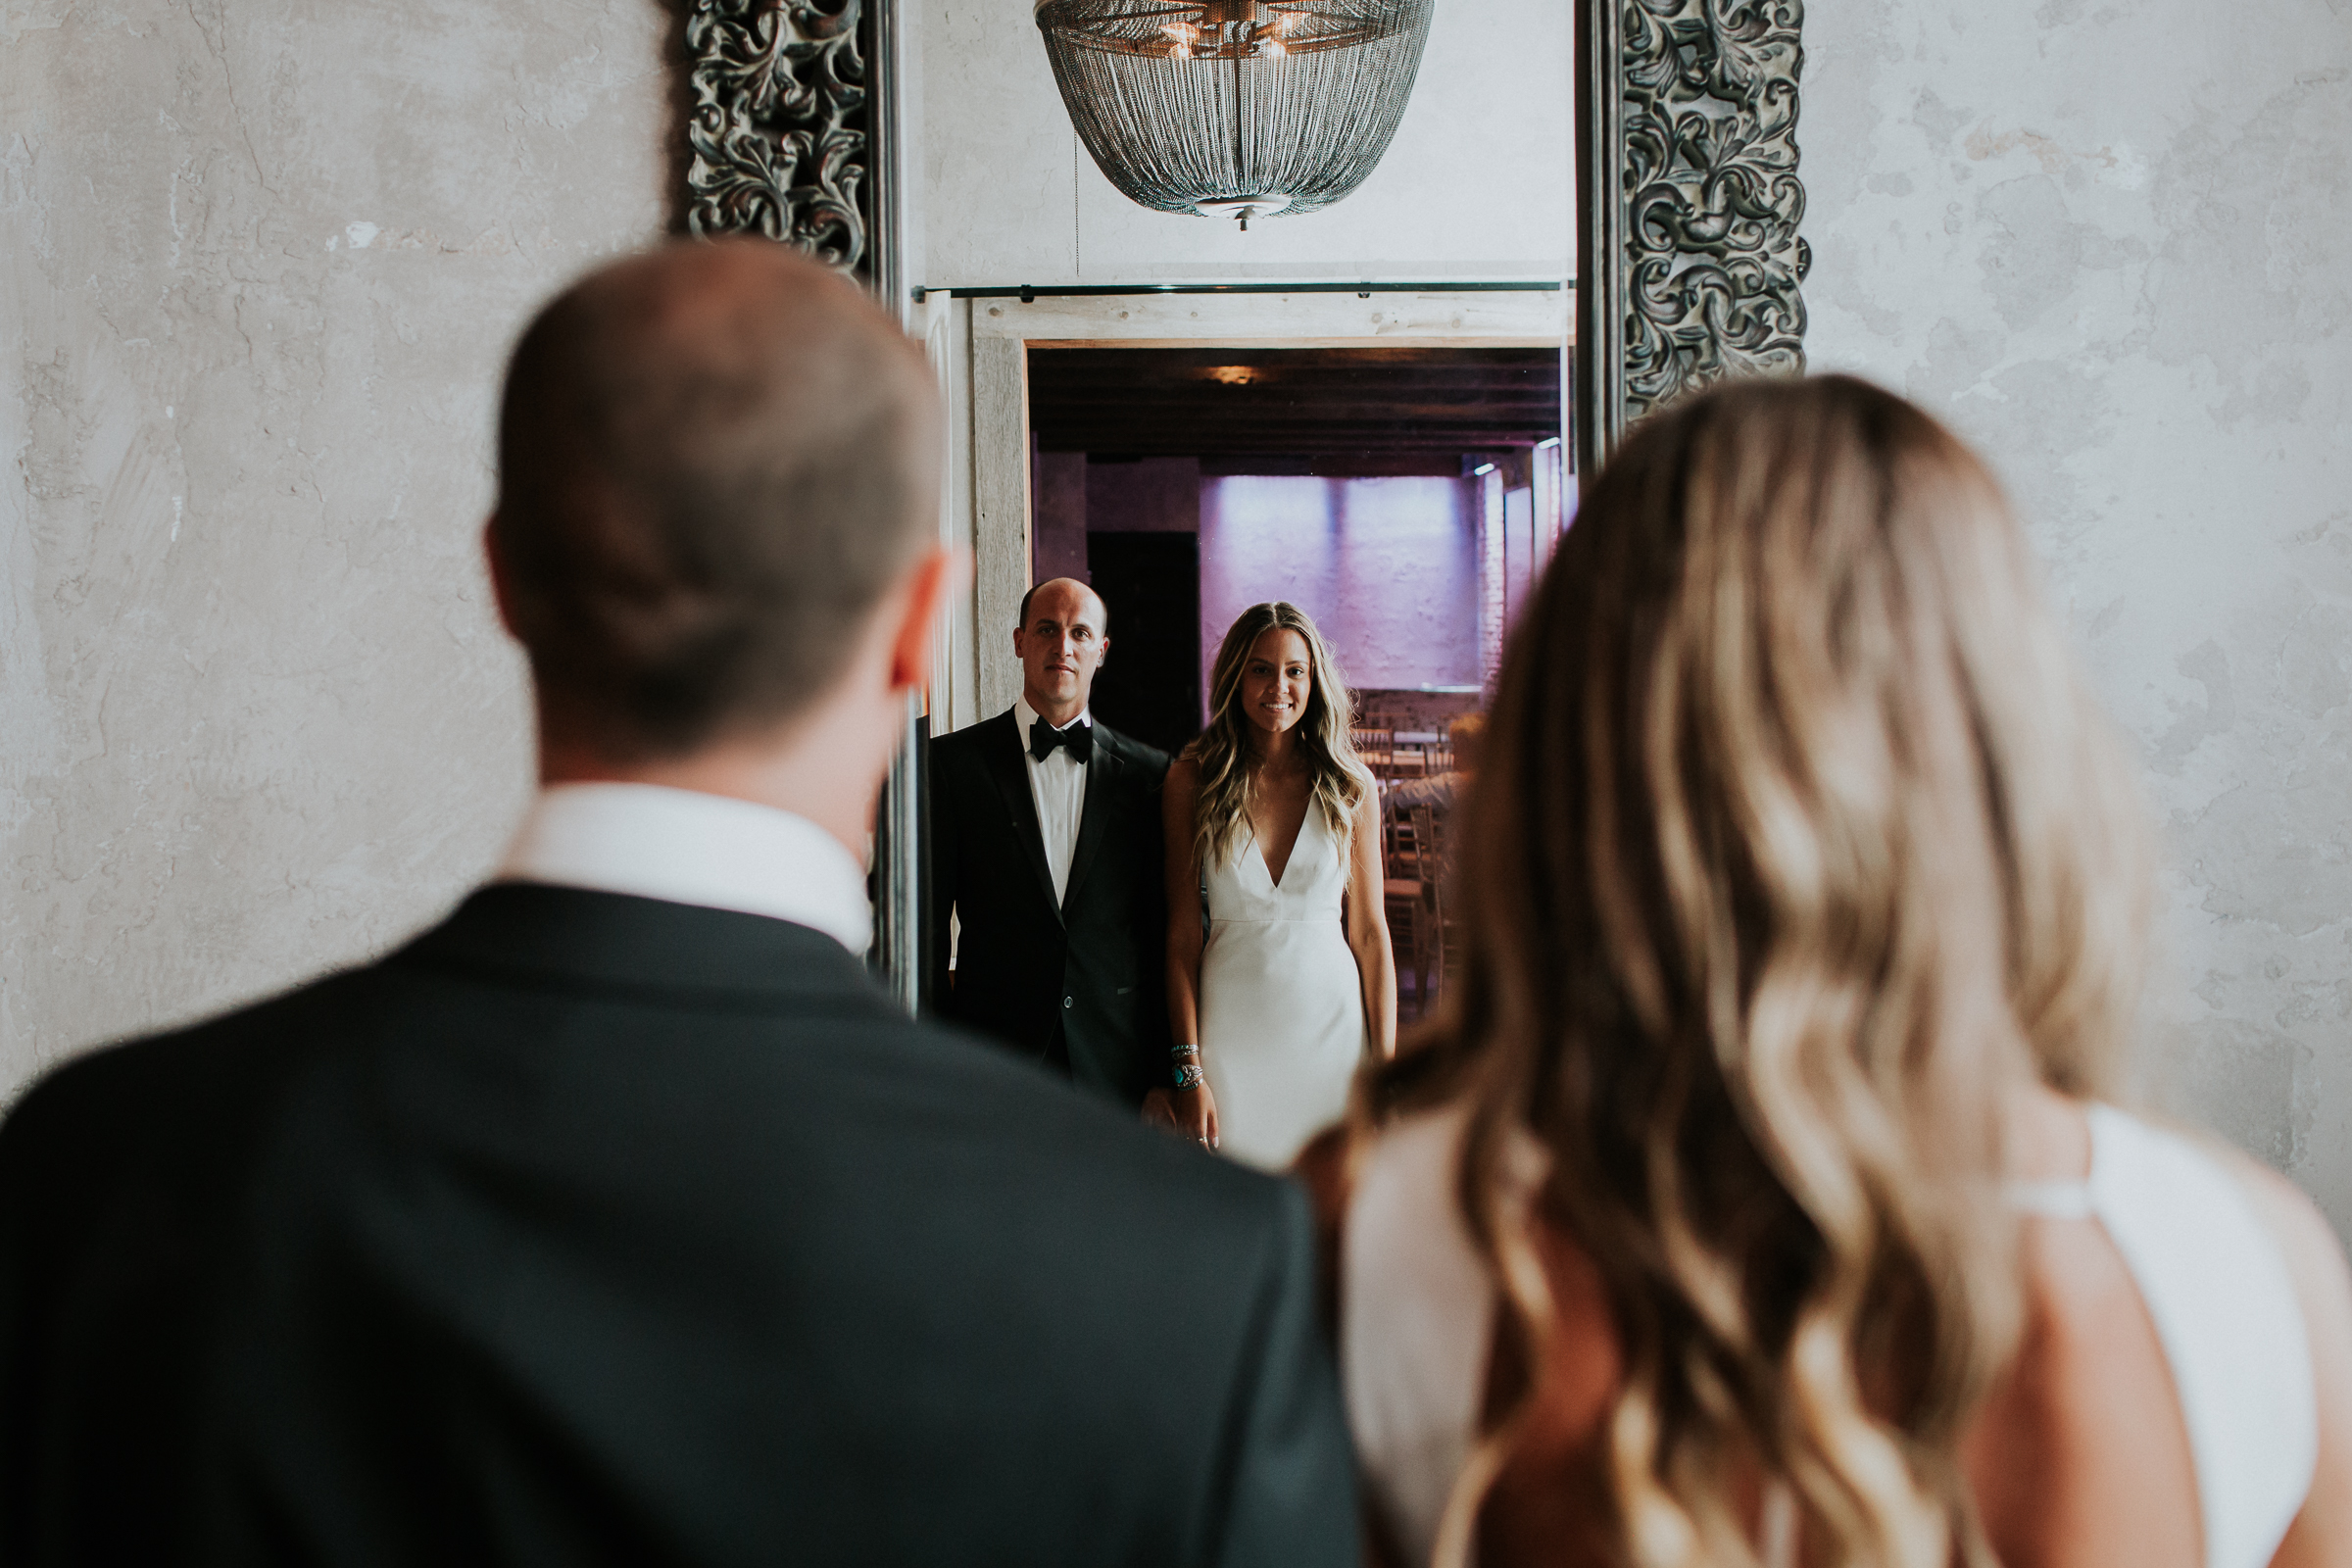 New-York-Documentary-Wedding-Photography-Best-Of-2017-by-Elvira-Kalviste-Photography-22.jpg